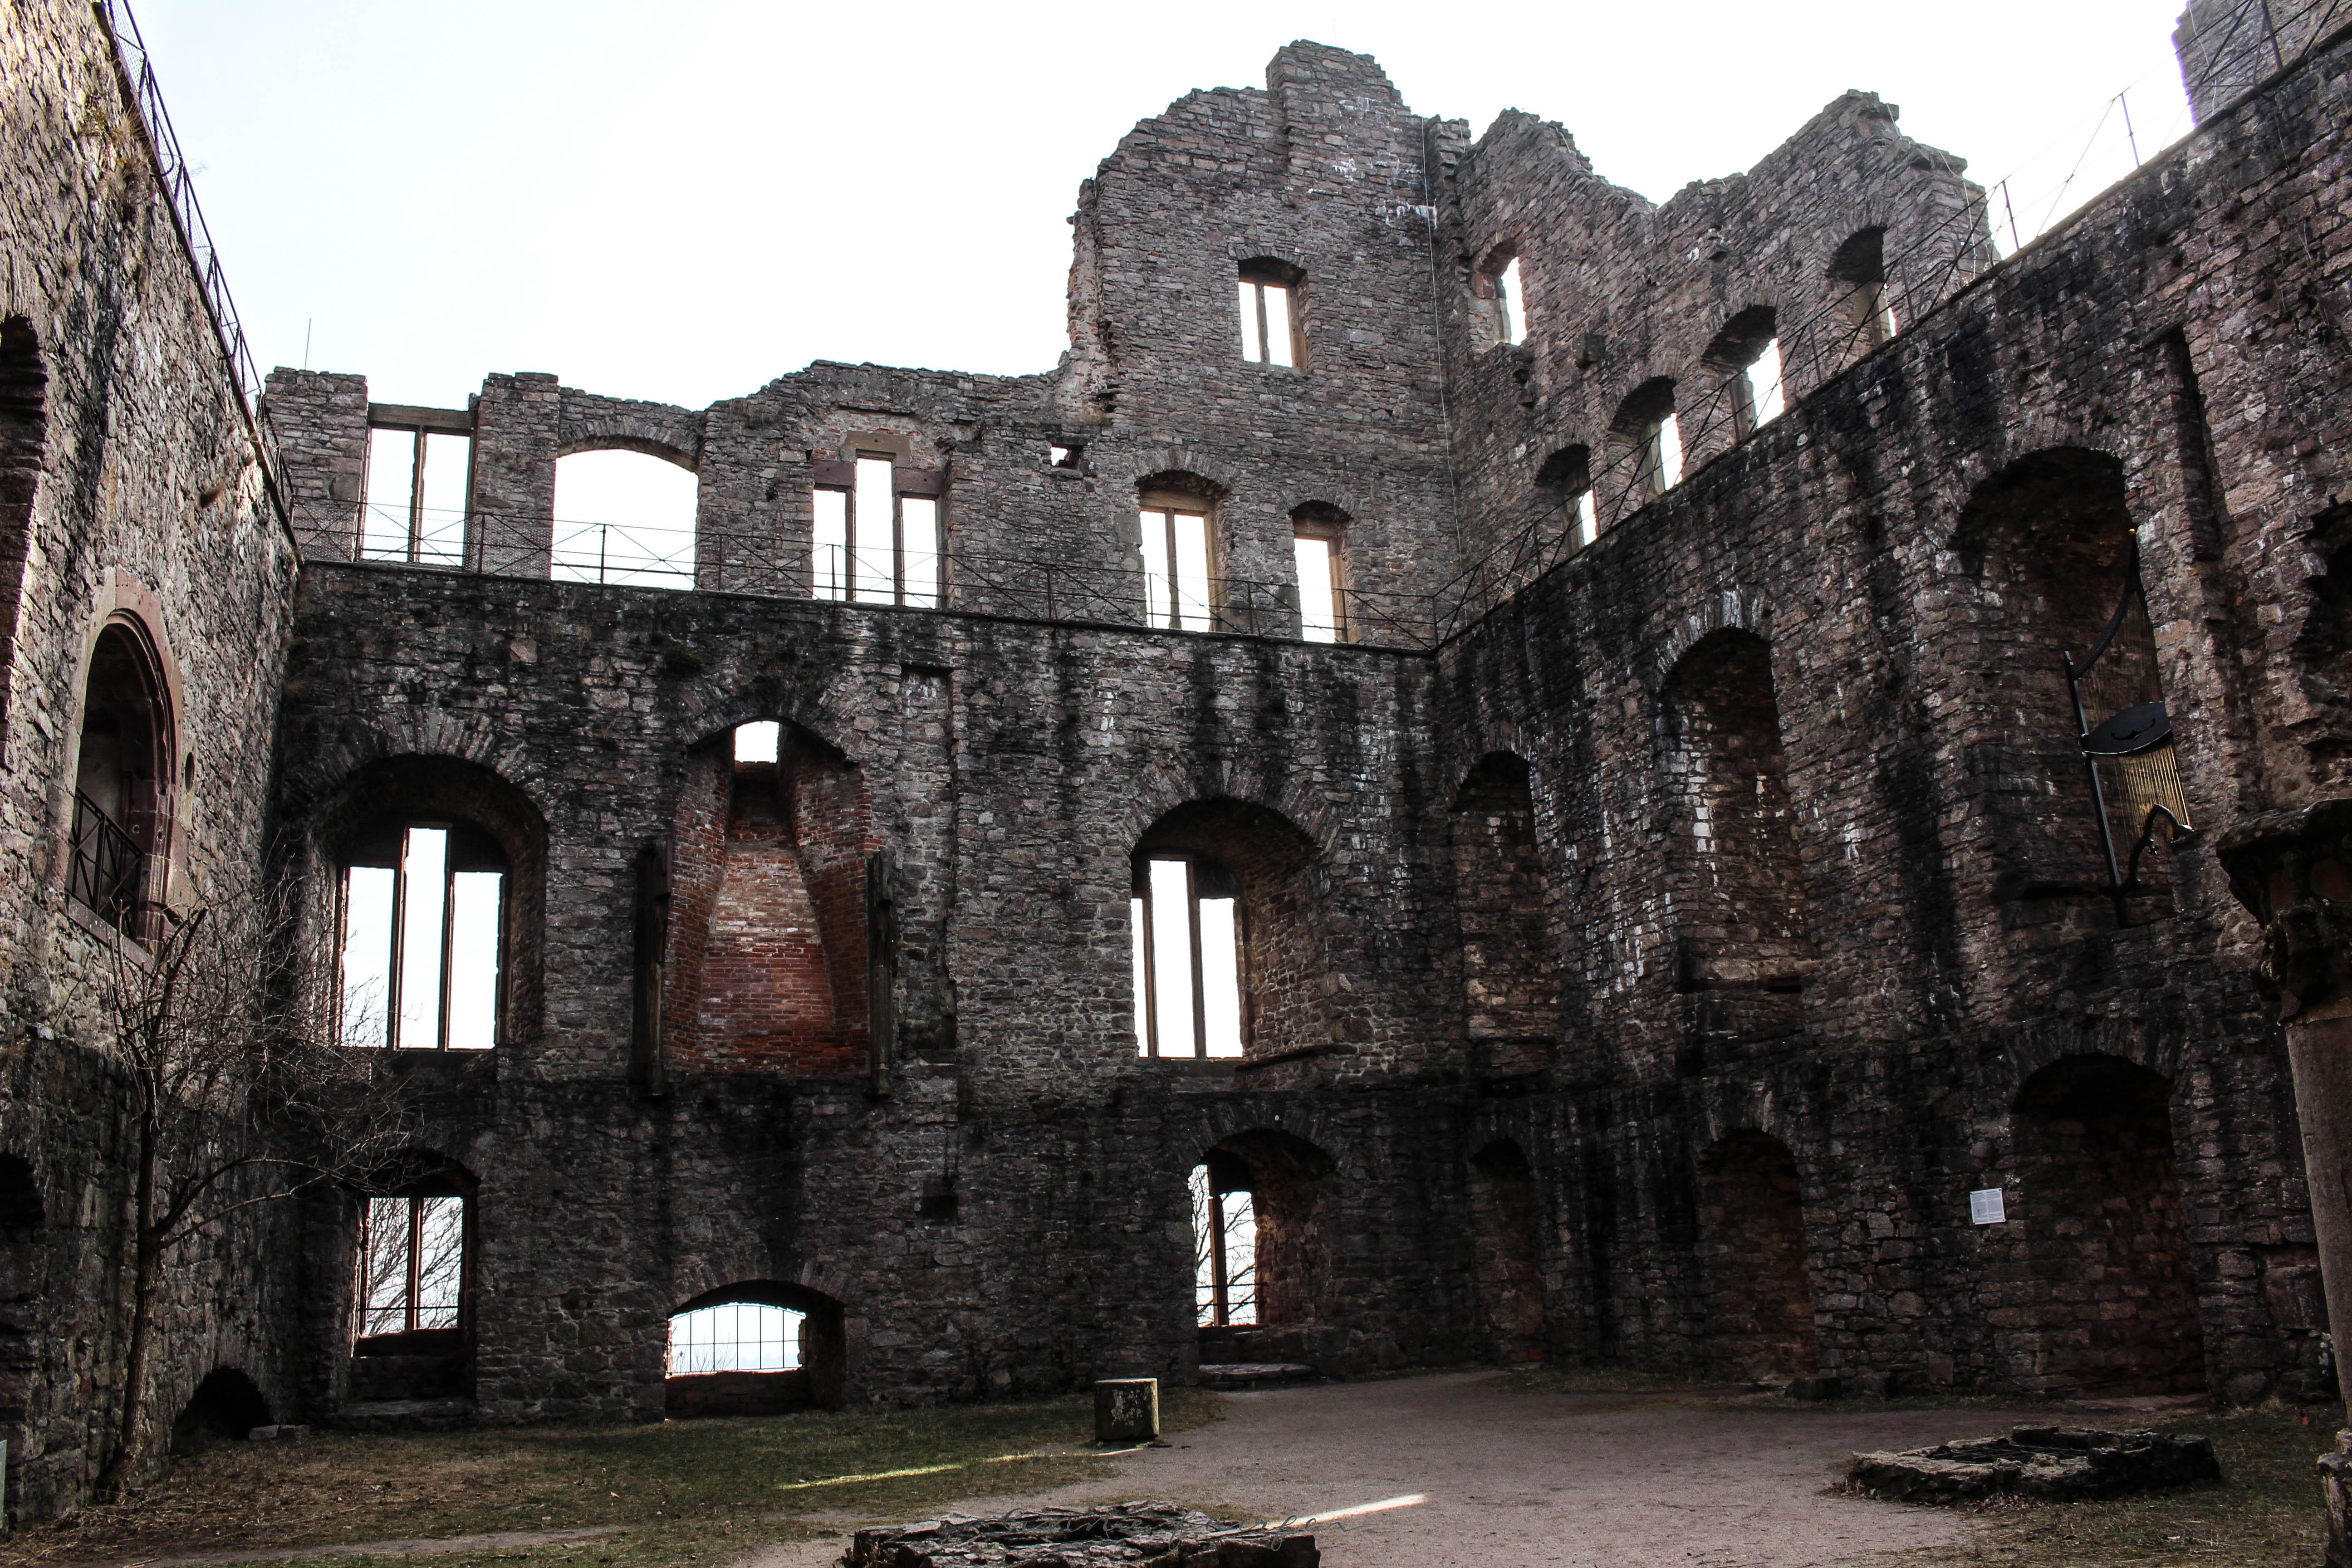 "Altes Schloss ""Old Castle"" in Black Forest Germany Built in 1102AD"